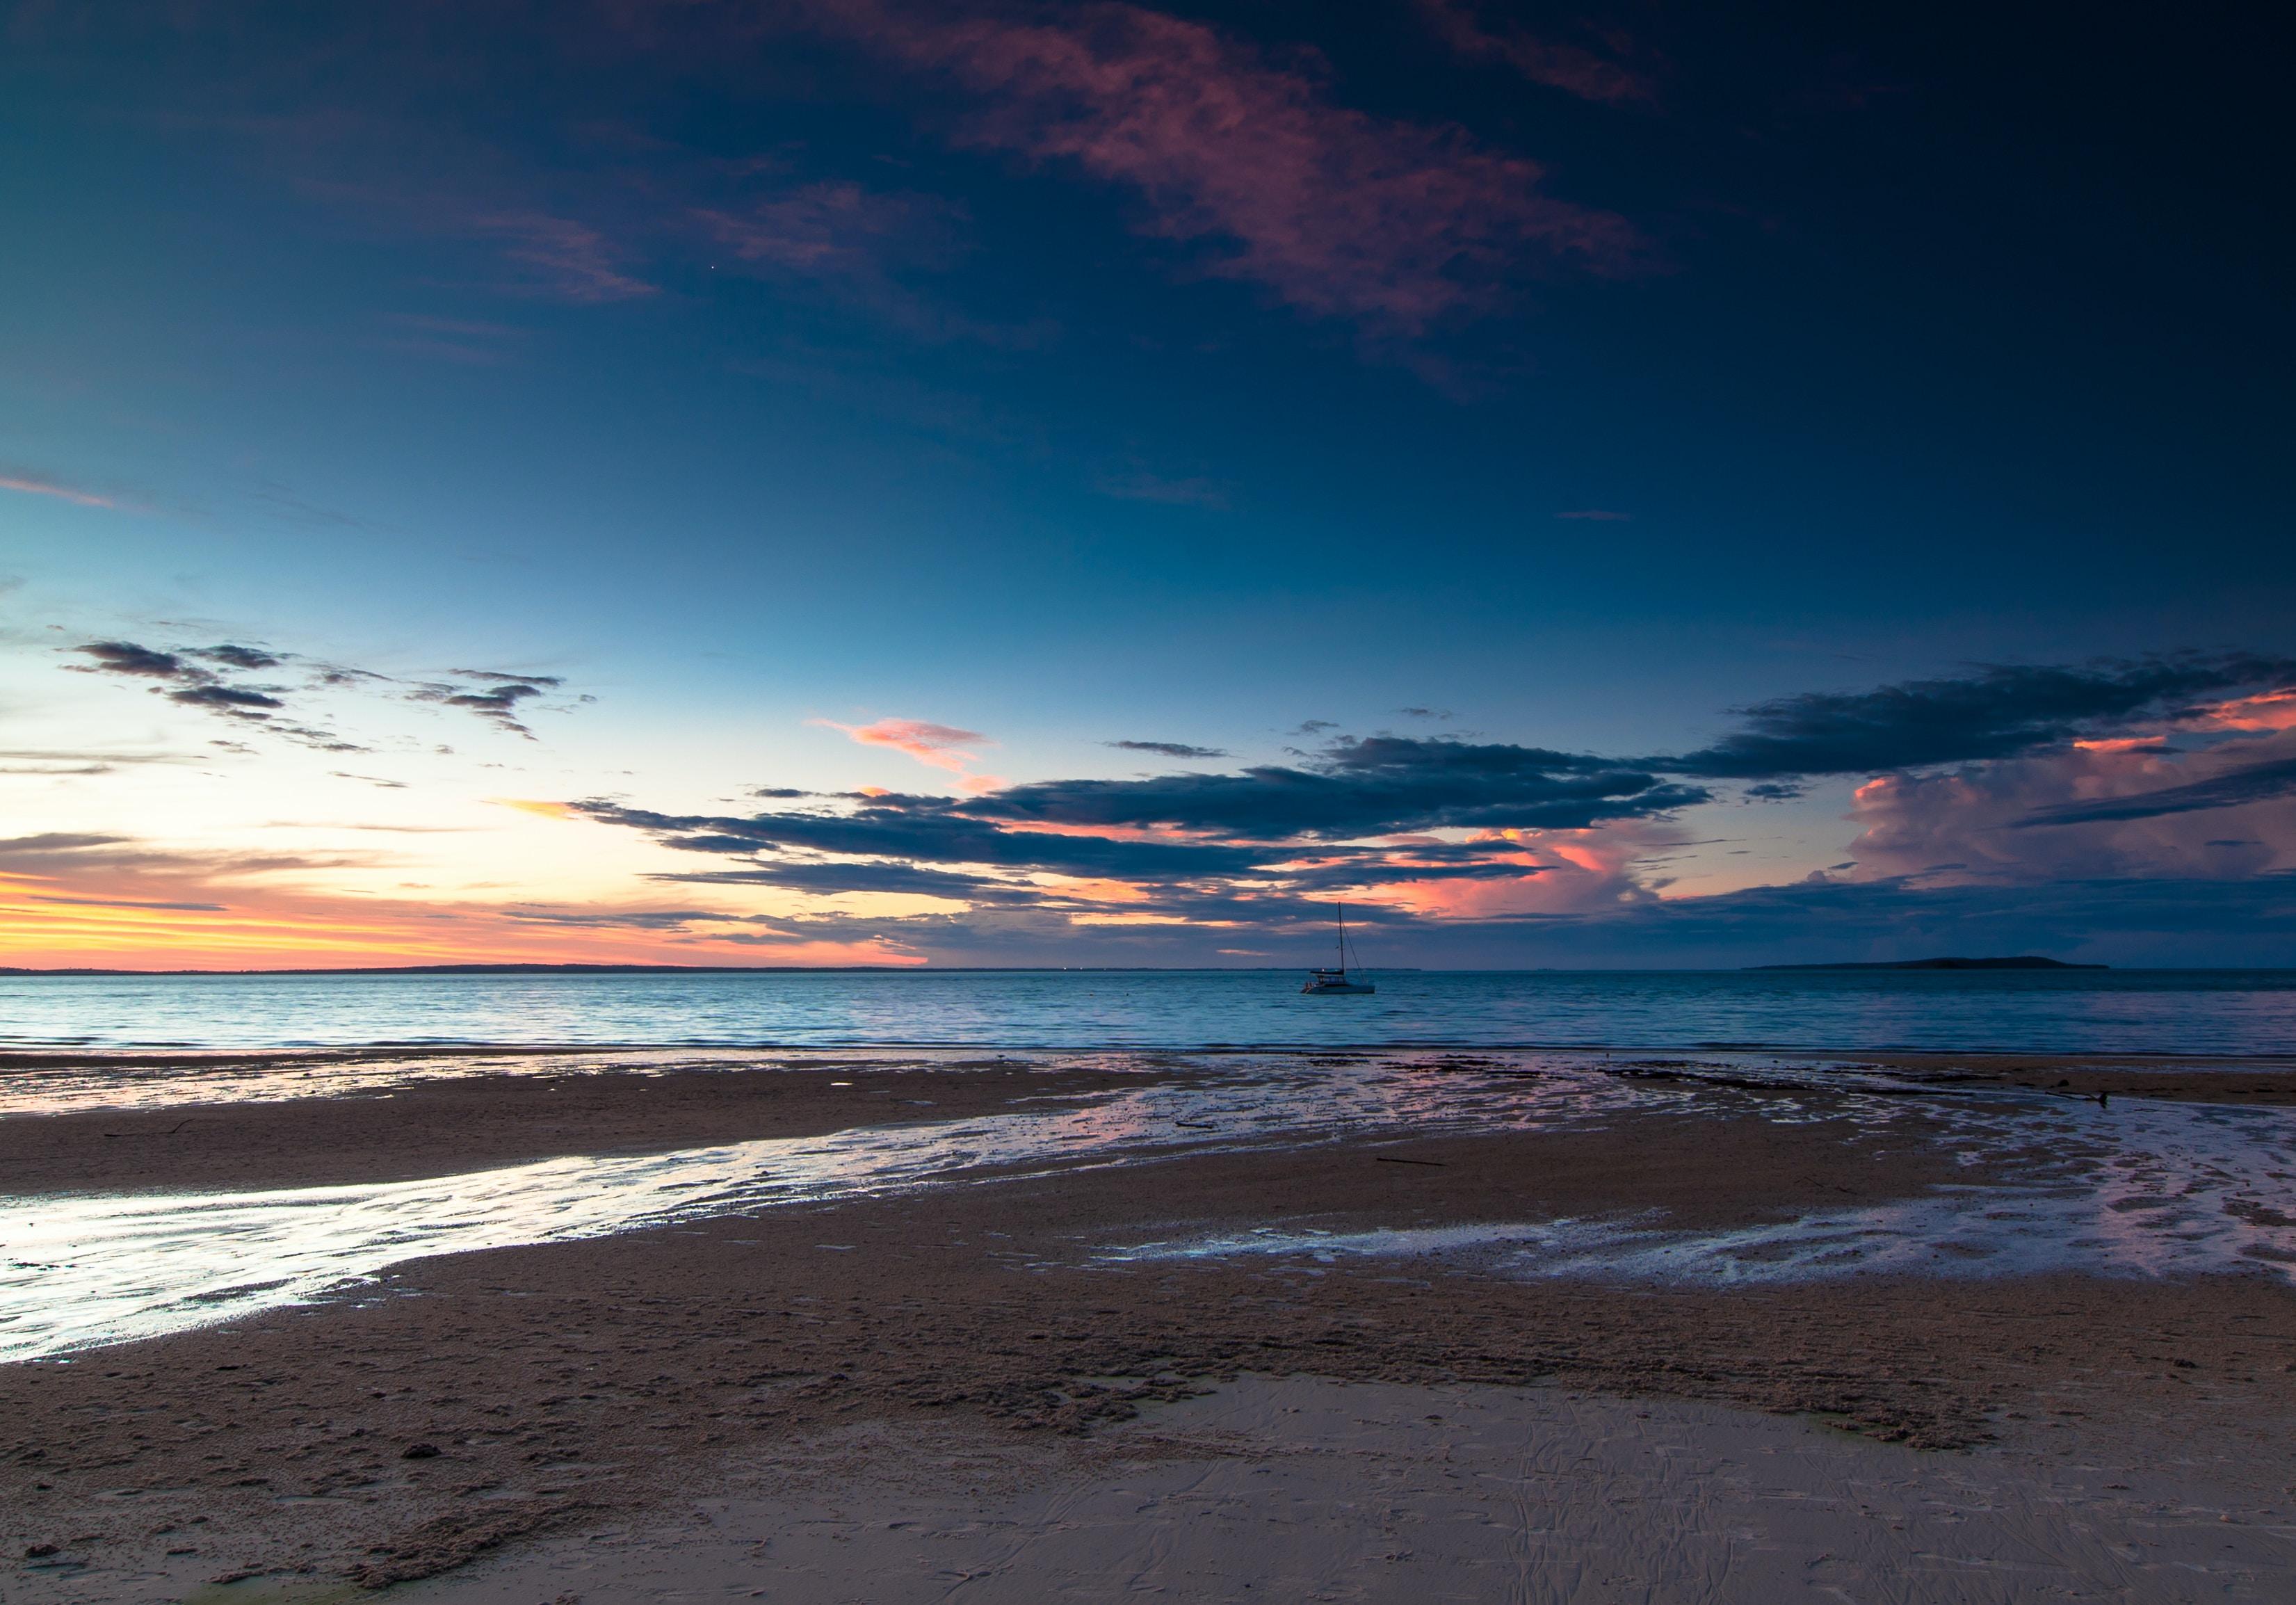 landscape of seashore during dusk